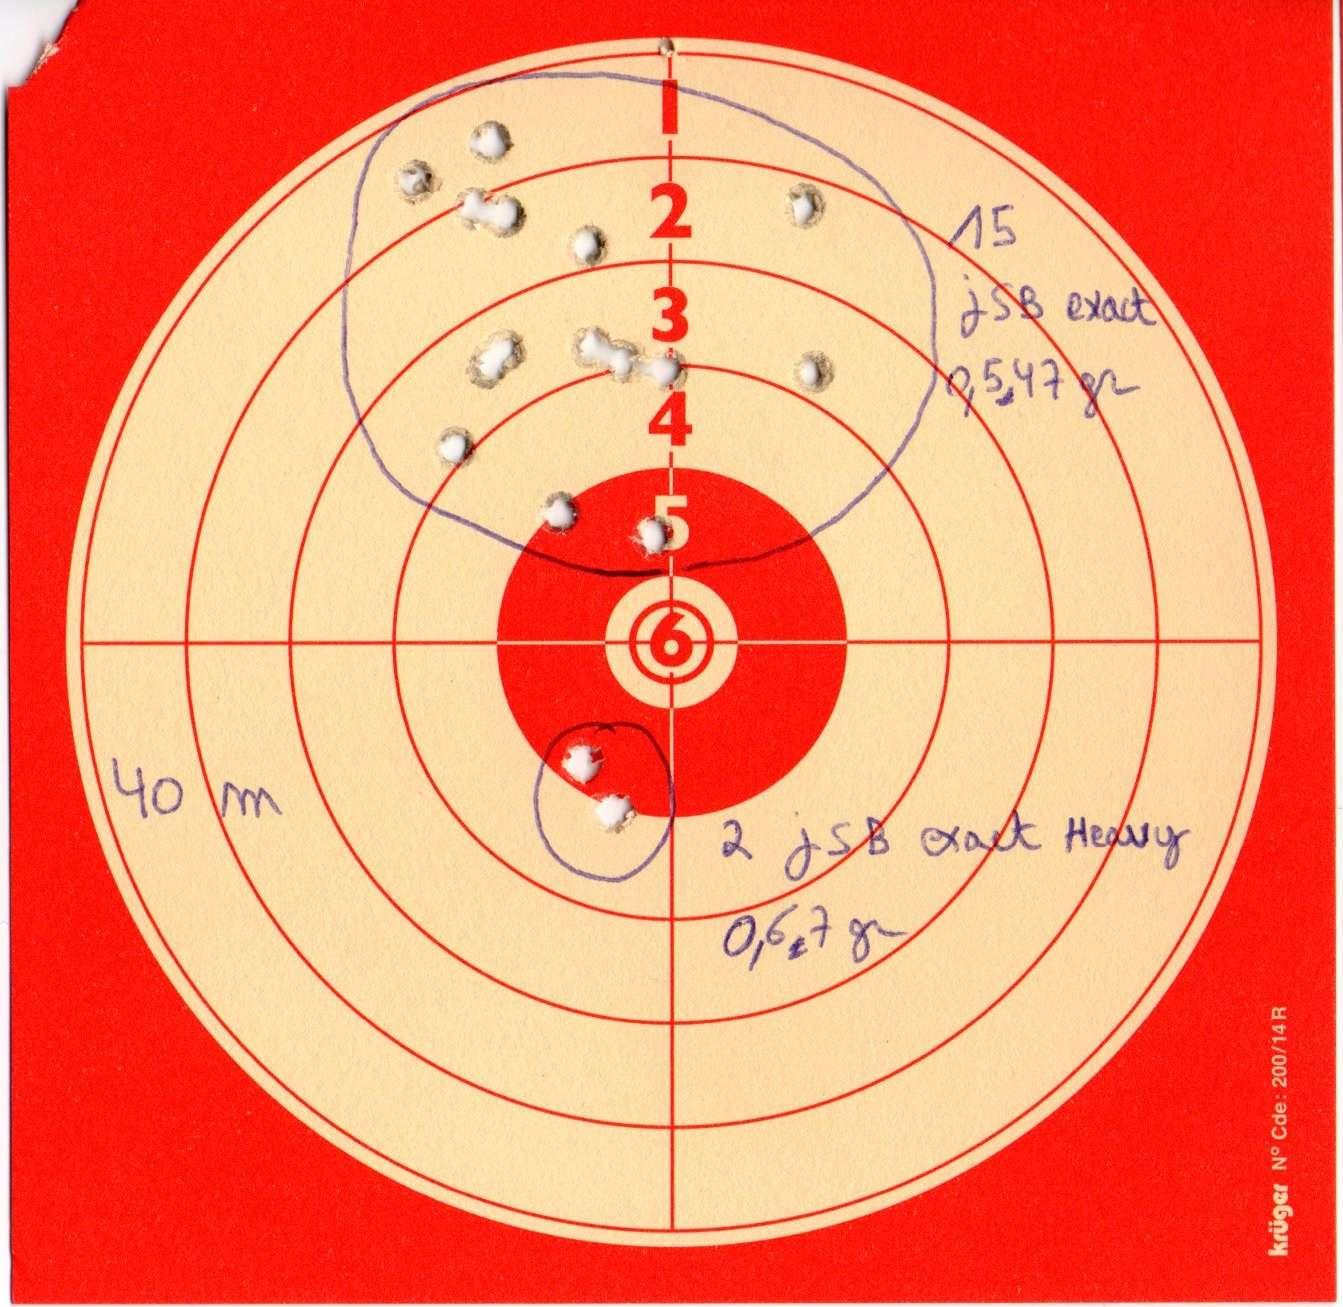 Walther LGV 4,5 à 40m C110